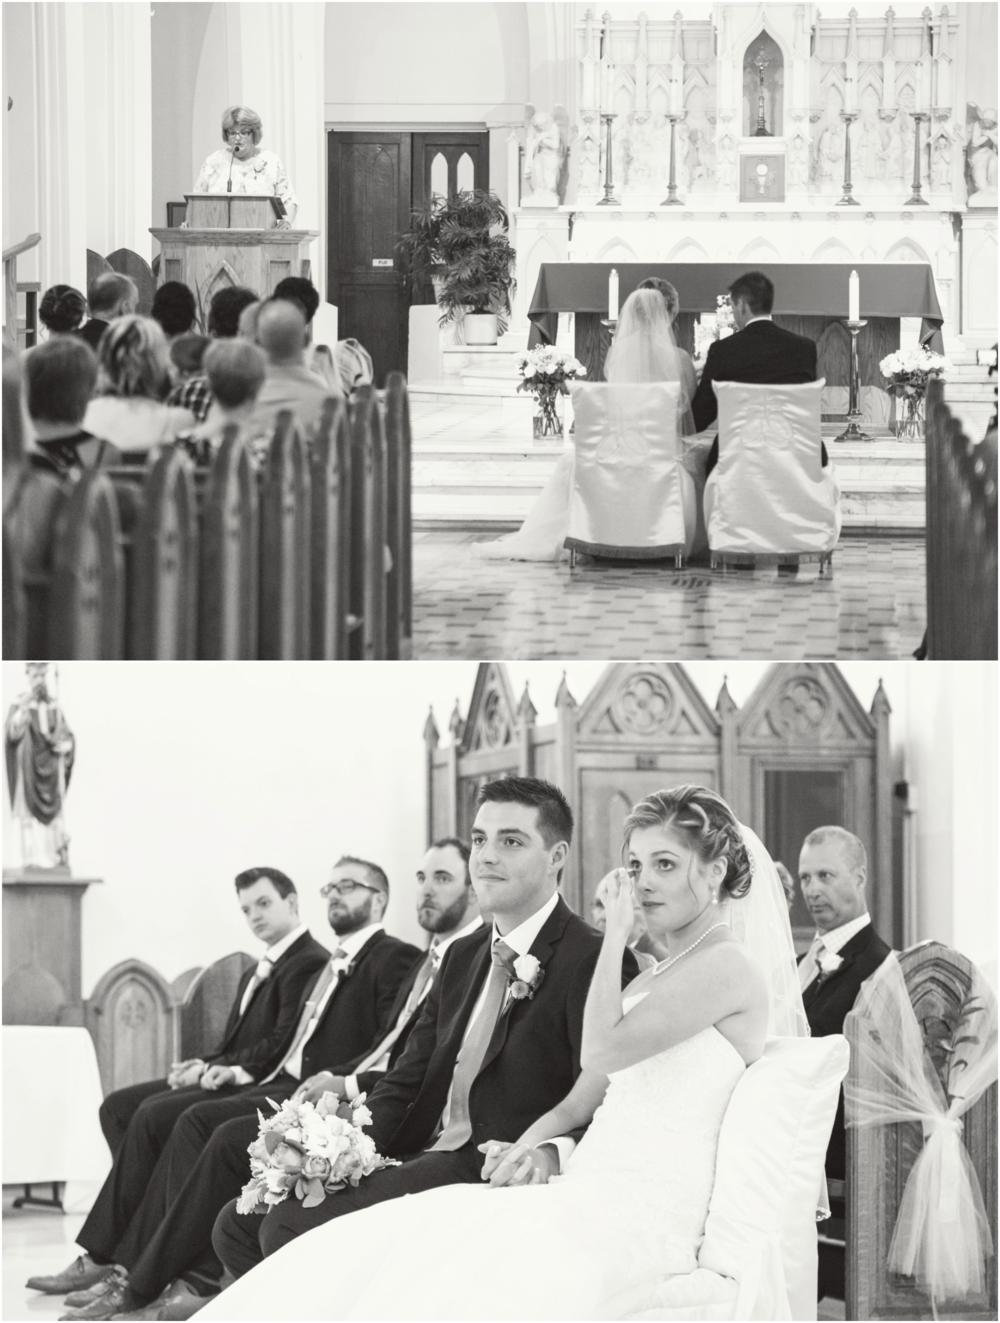 st_patricks_church_wedding_04.png